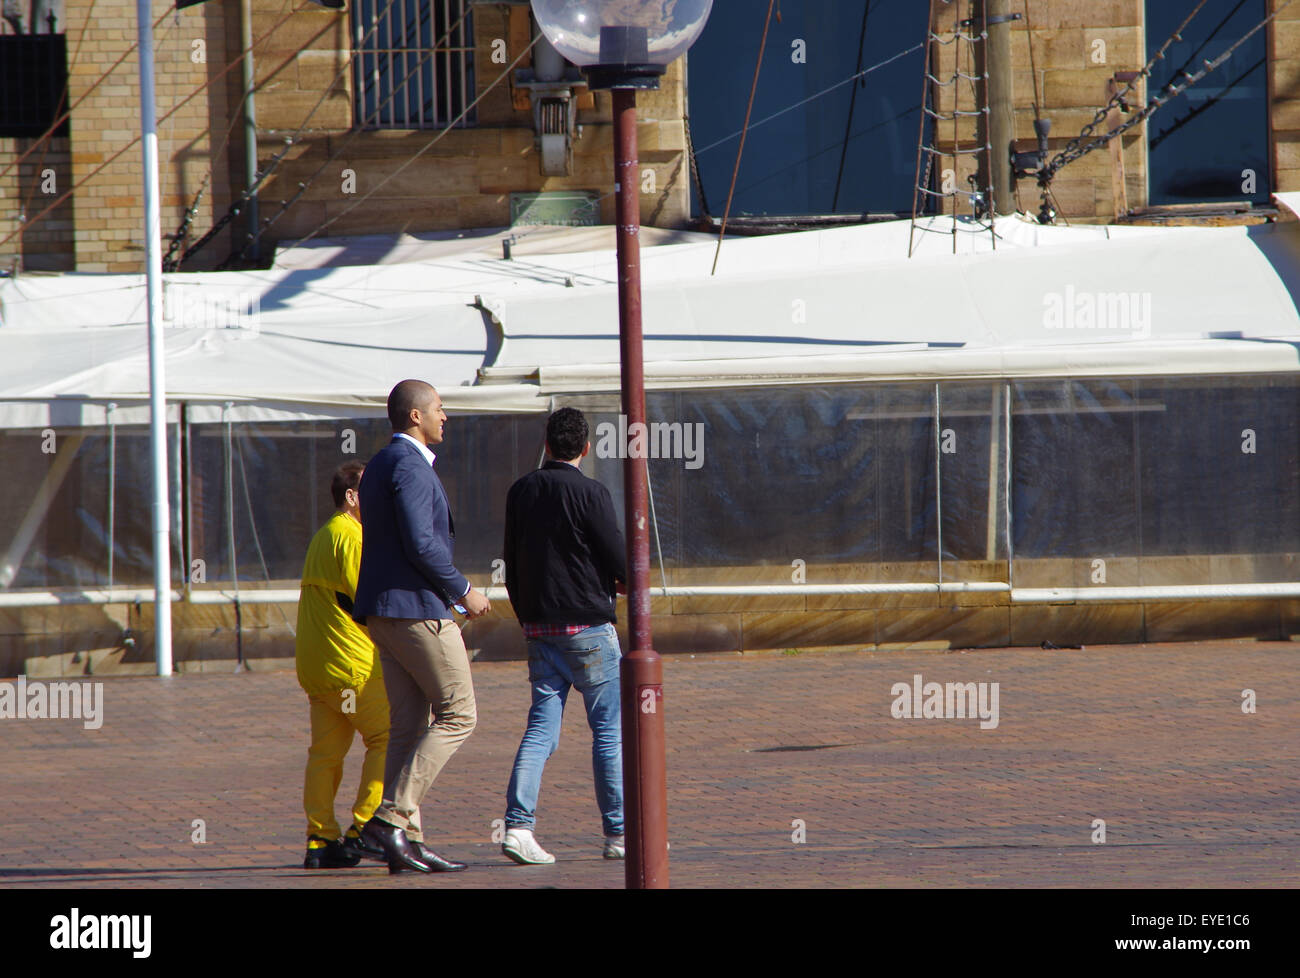 Sydney, Australia. 27th July, 2015. Geoffrey Eldesten, Blake Garvey and James Mathison can be seen walking together - Stock Image